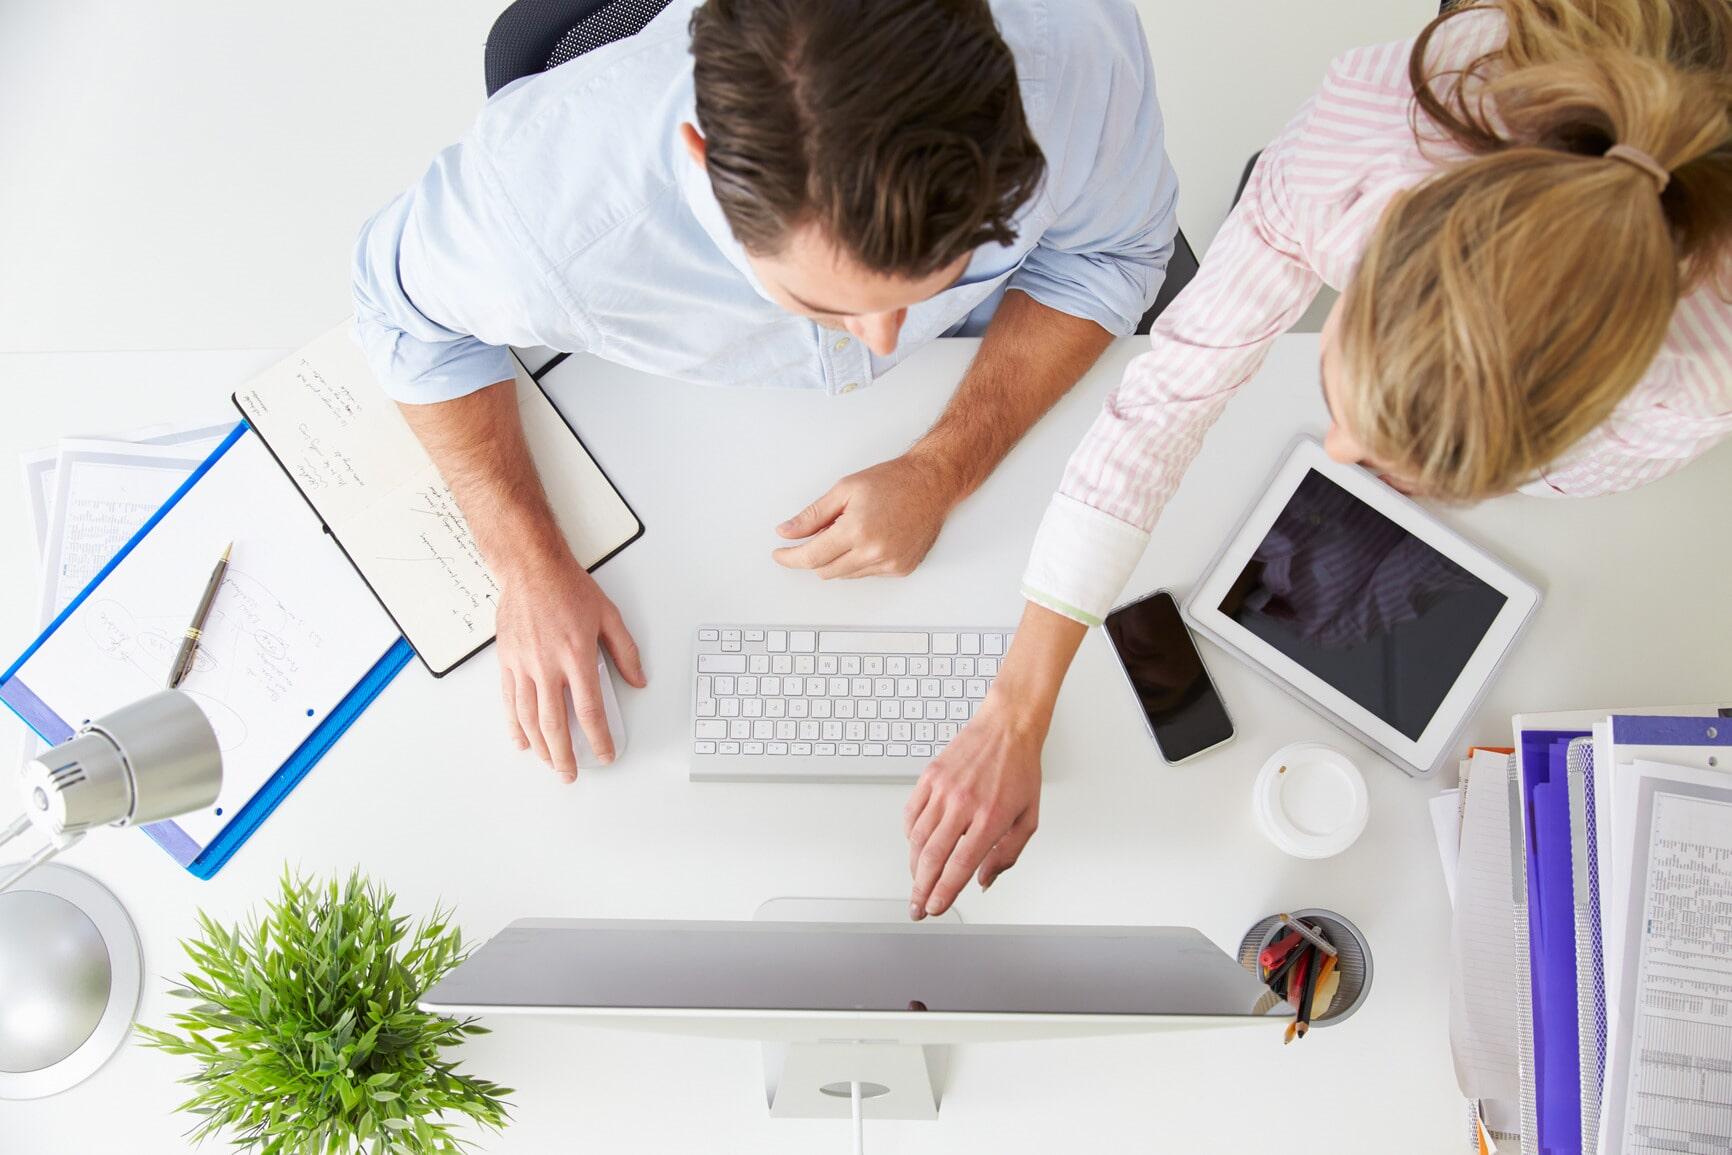 ROILifter Internet Marketing Services Miami Fl